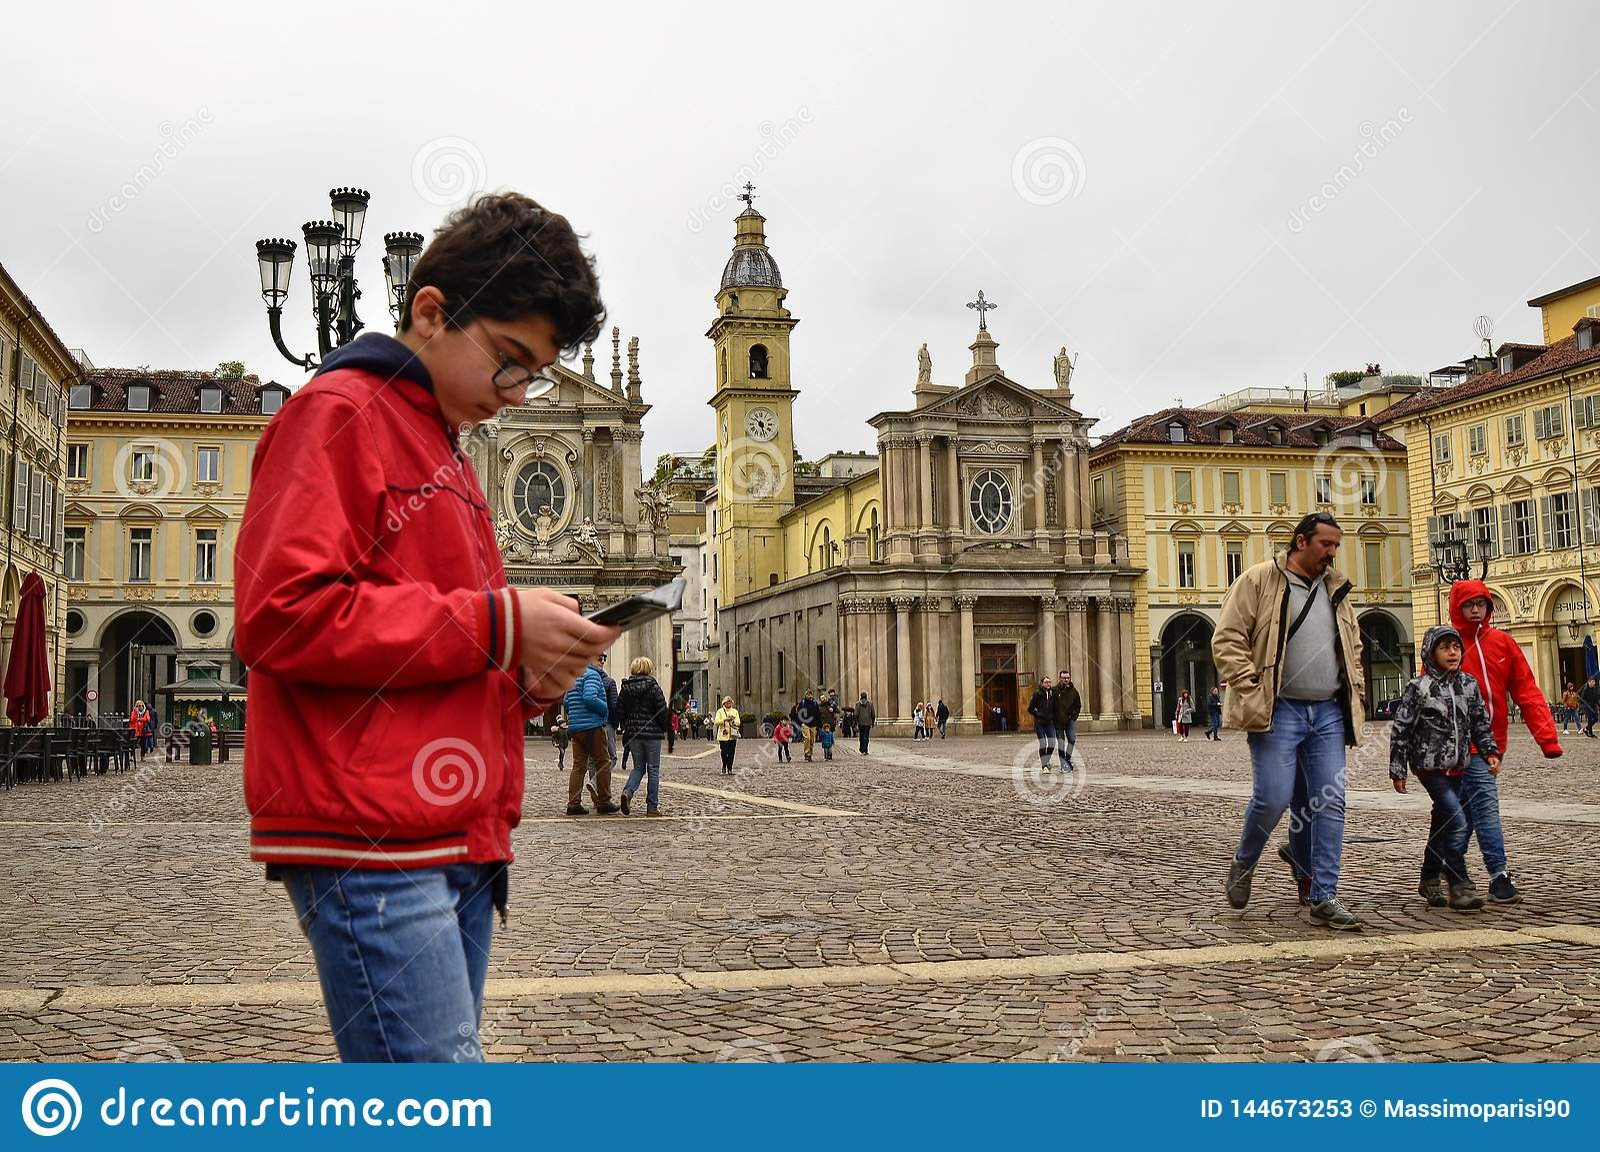 Turin, Piedmont, Italy. April 2019. Piazza San Carlo